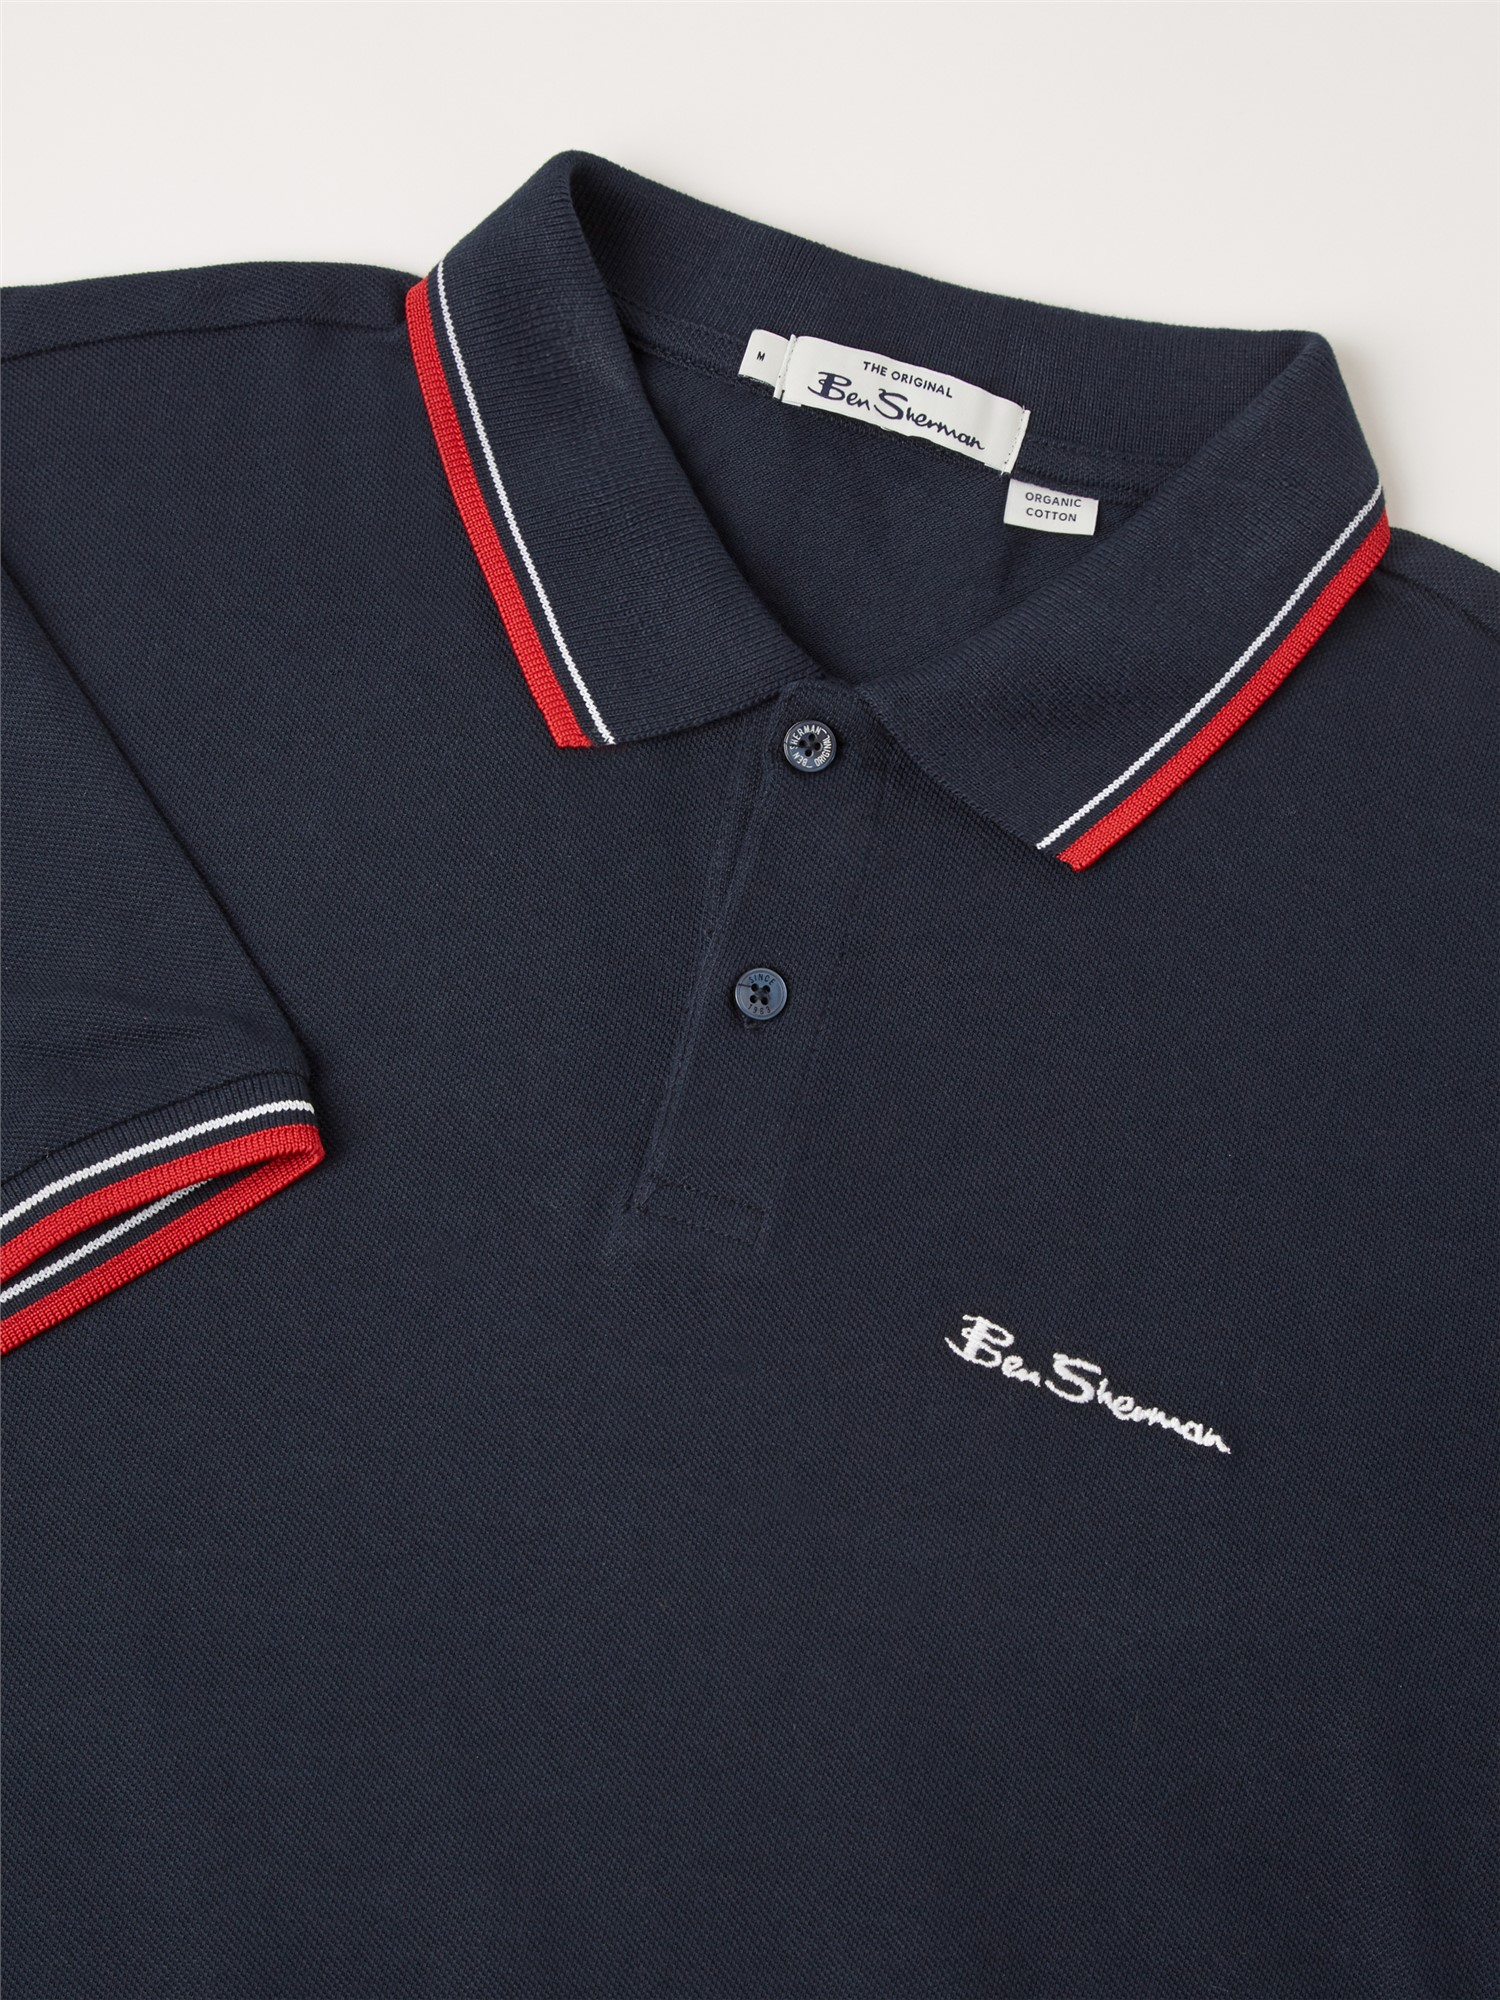 Navy Organic Signature Polo Shirt